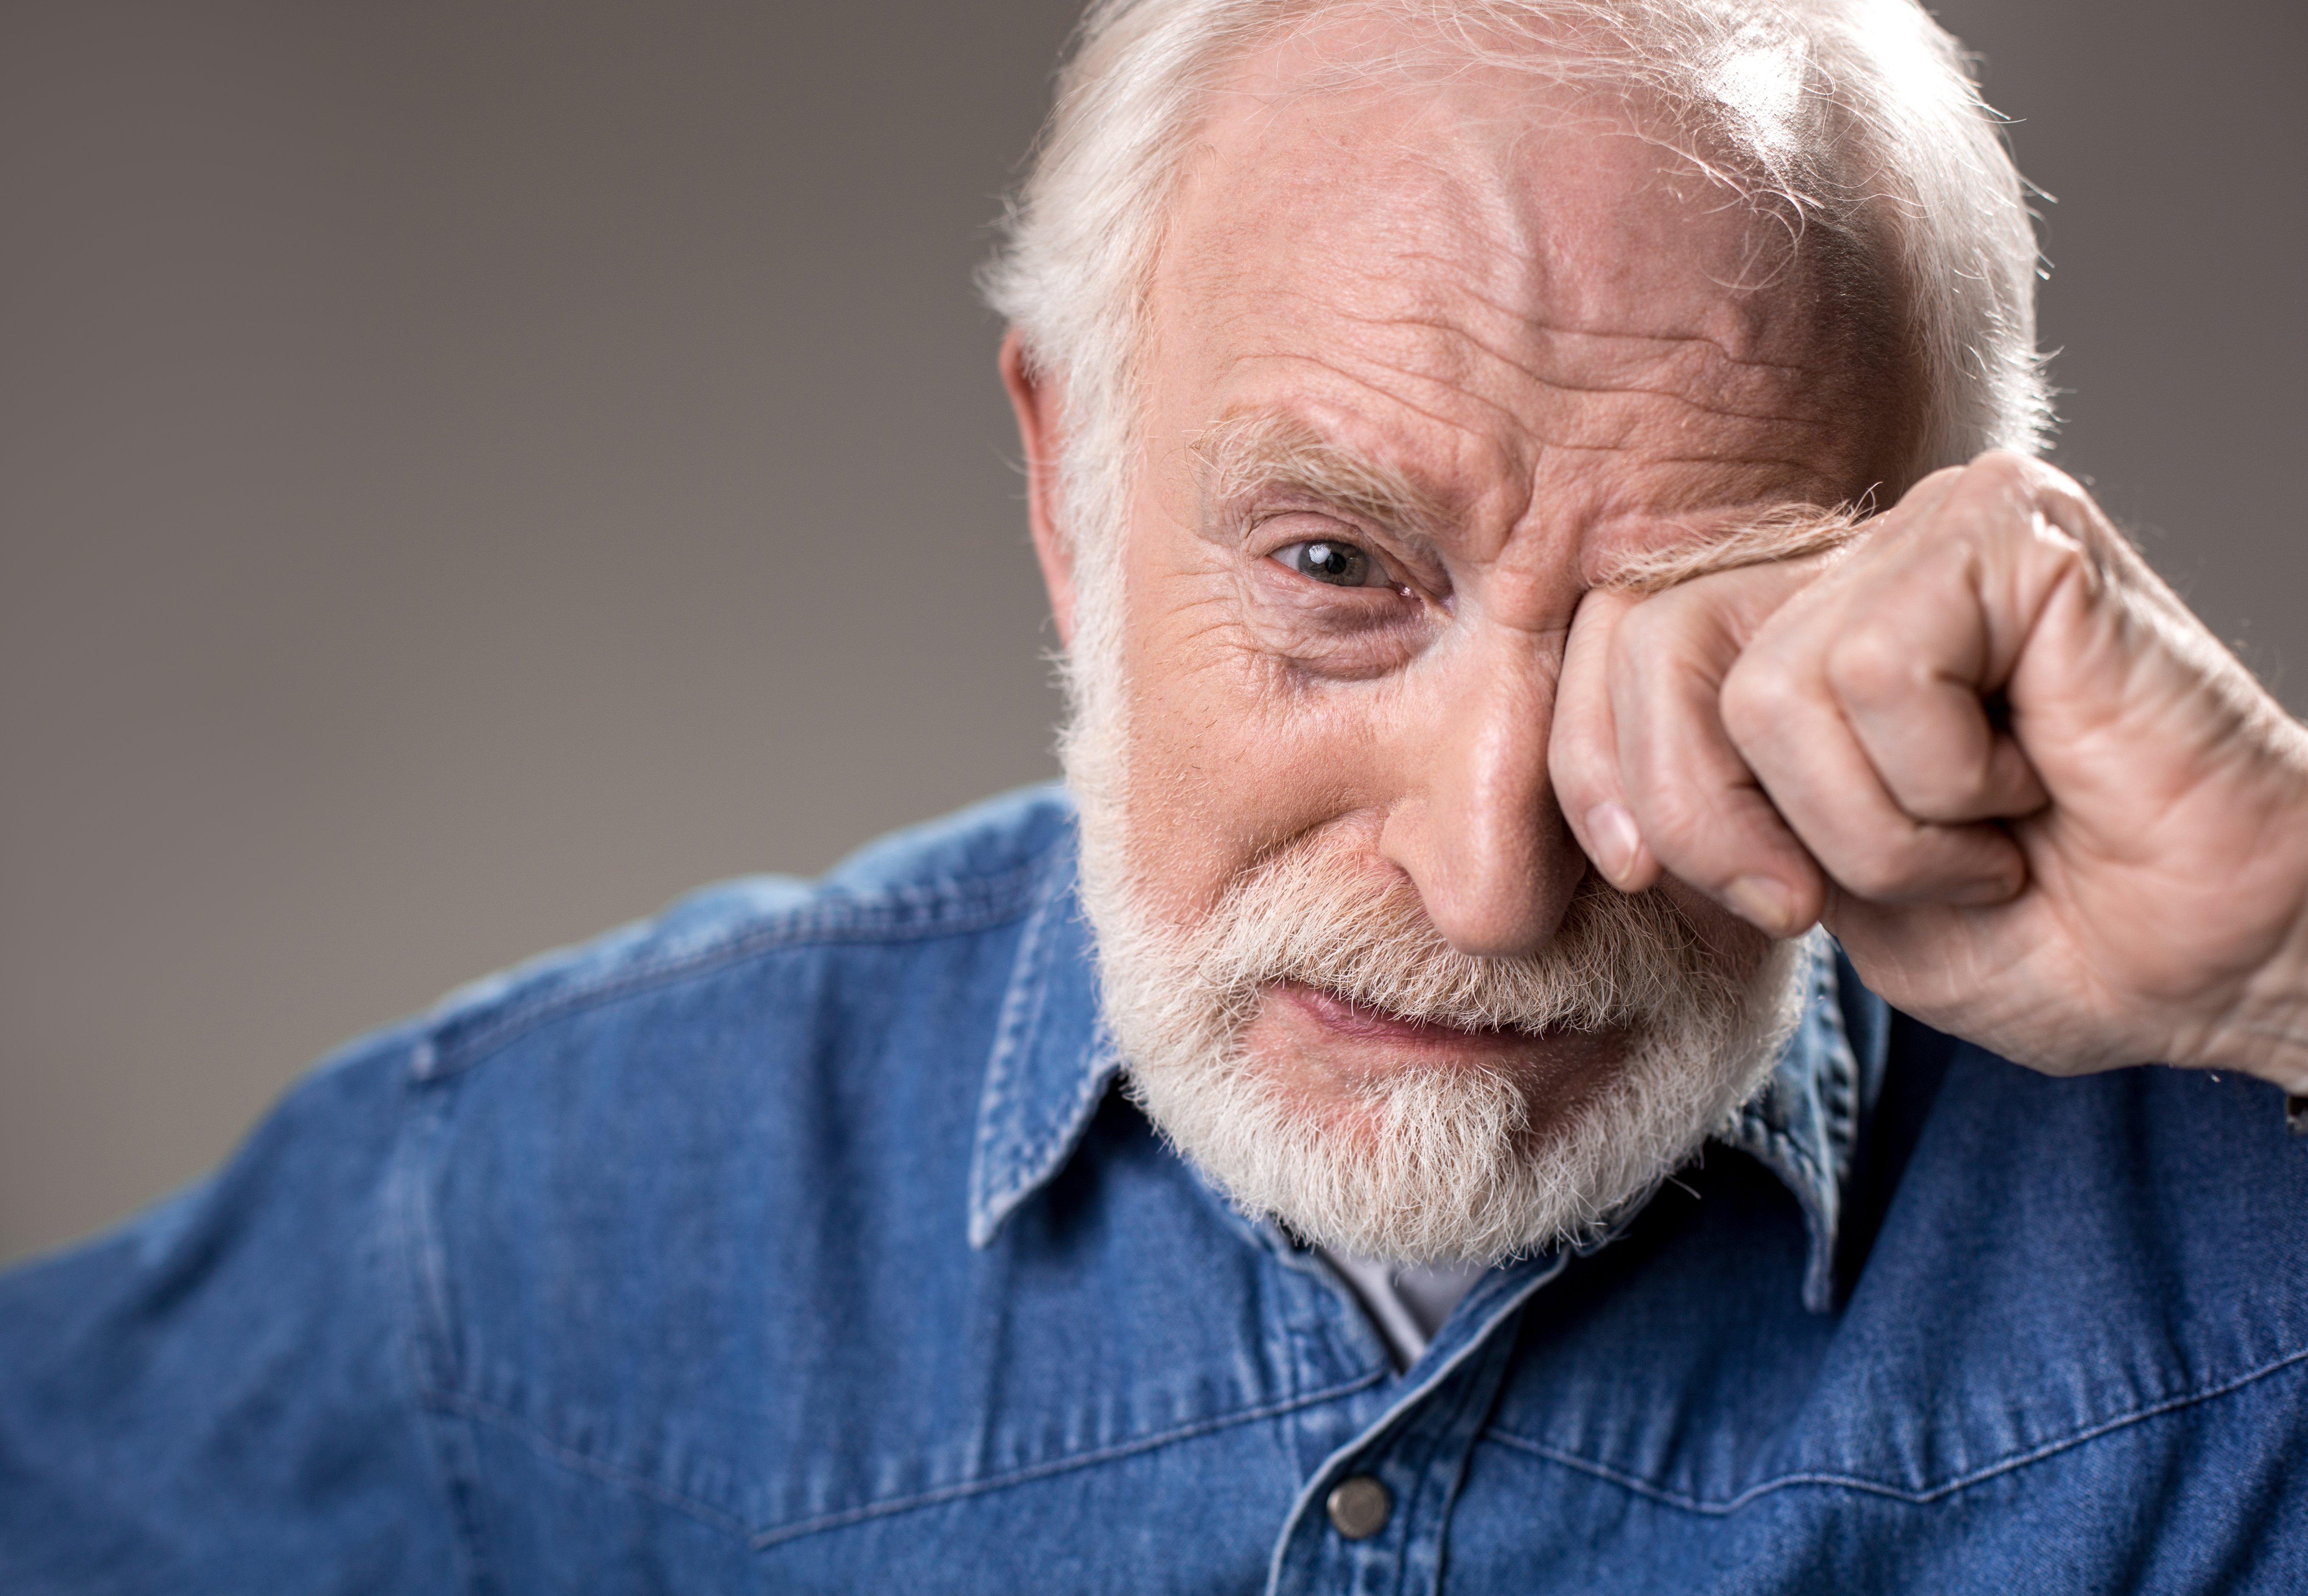 Elderly man rubbing his eye | Photo: Shutterstock